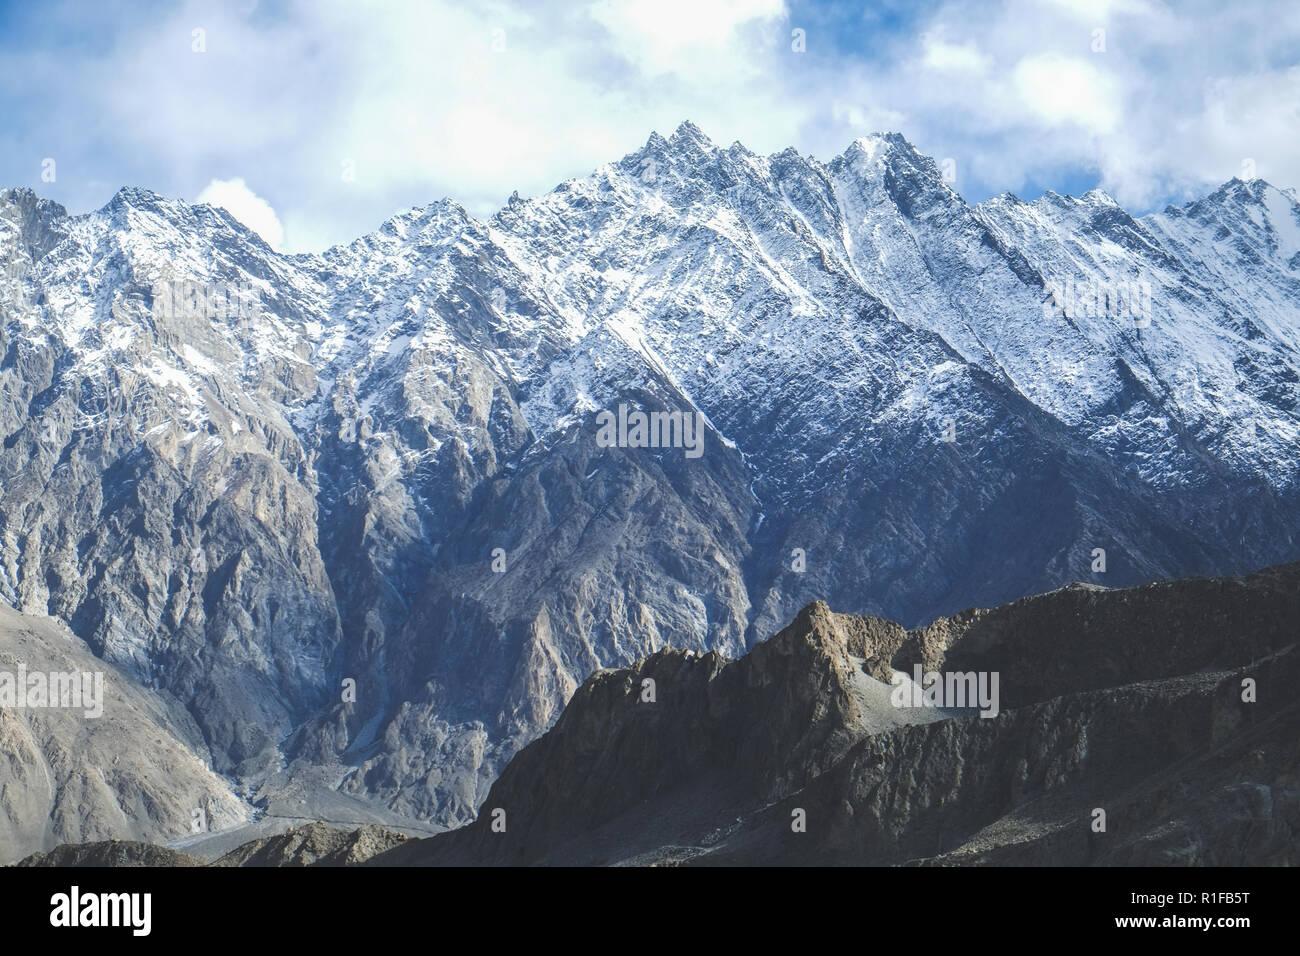 Snow capped mountains in Karakoram range. Passu, Pakistan. - Stock Image